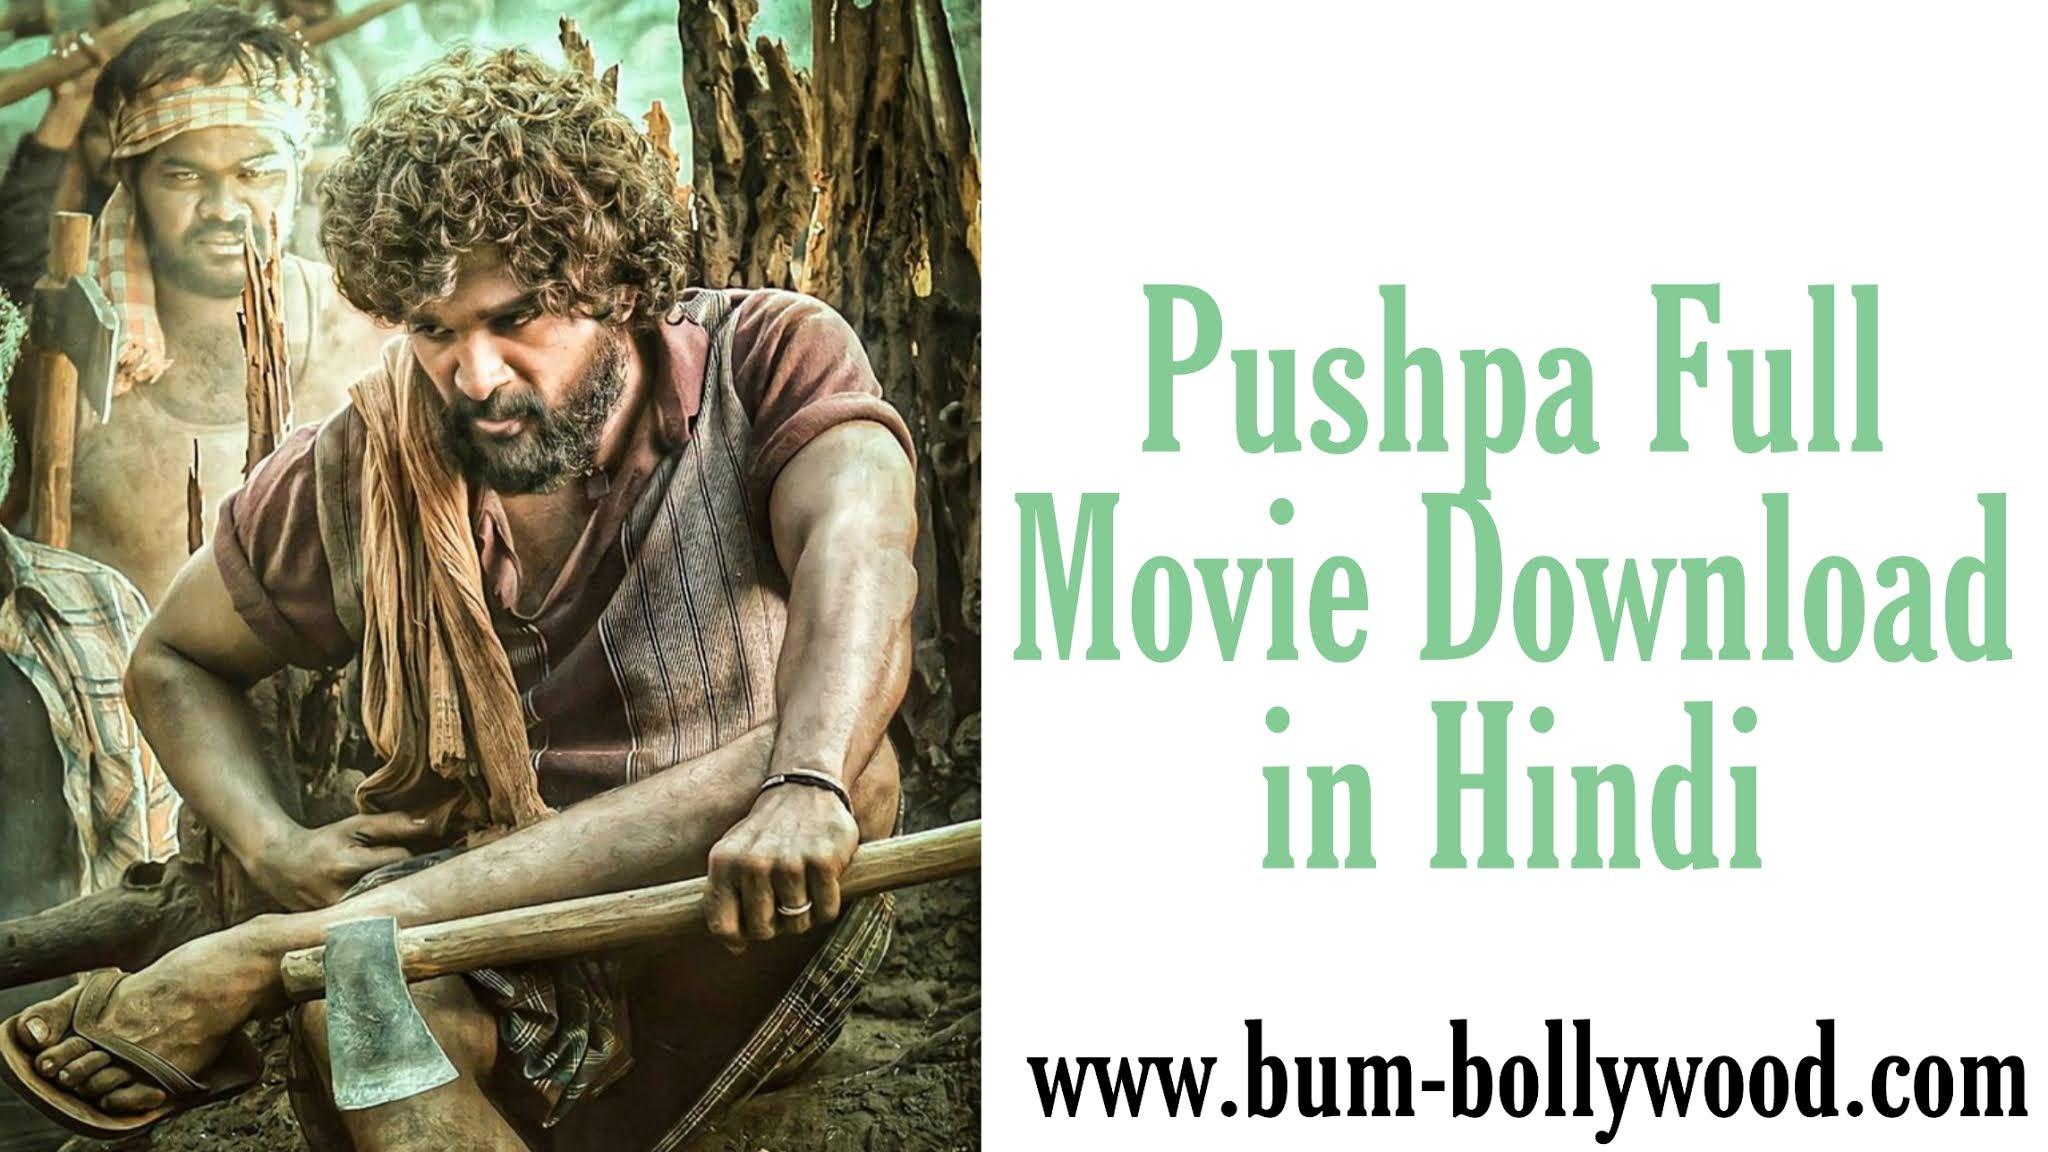 Pushpa Full Movie Download in Hindi 480p filmyzilla